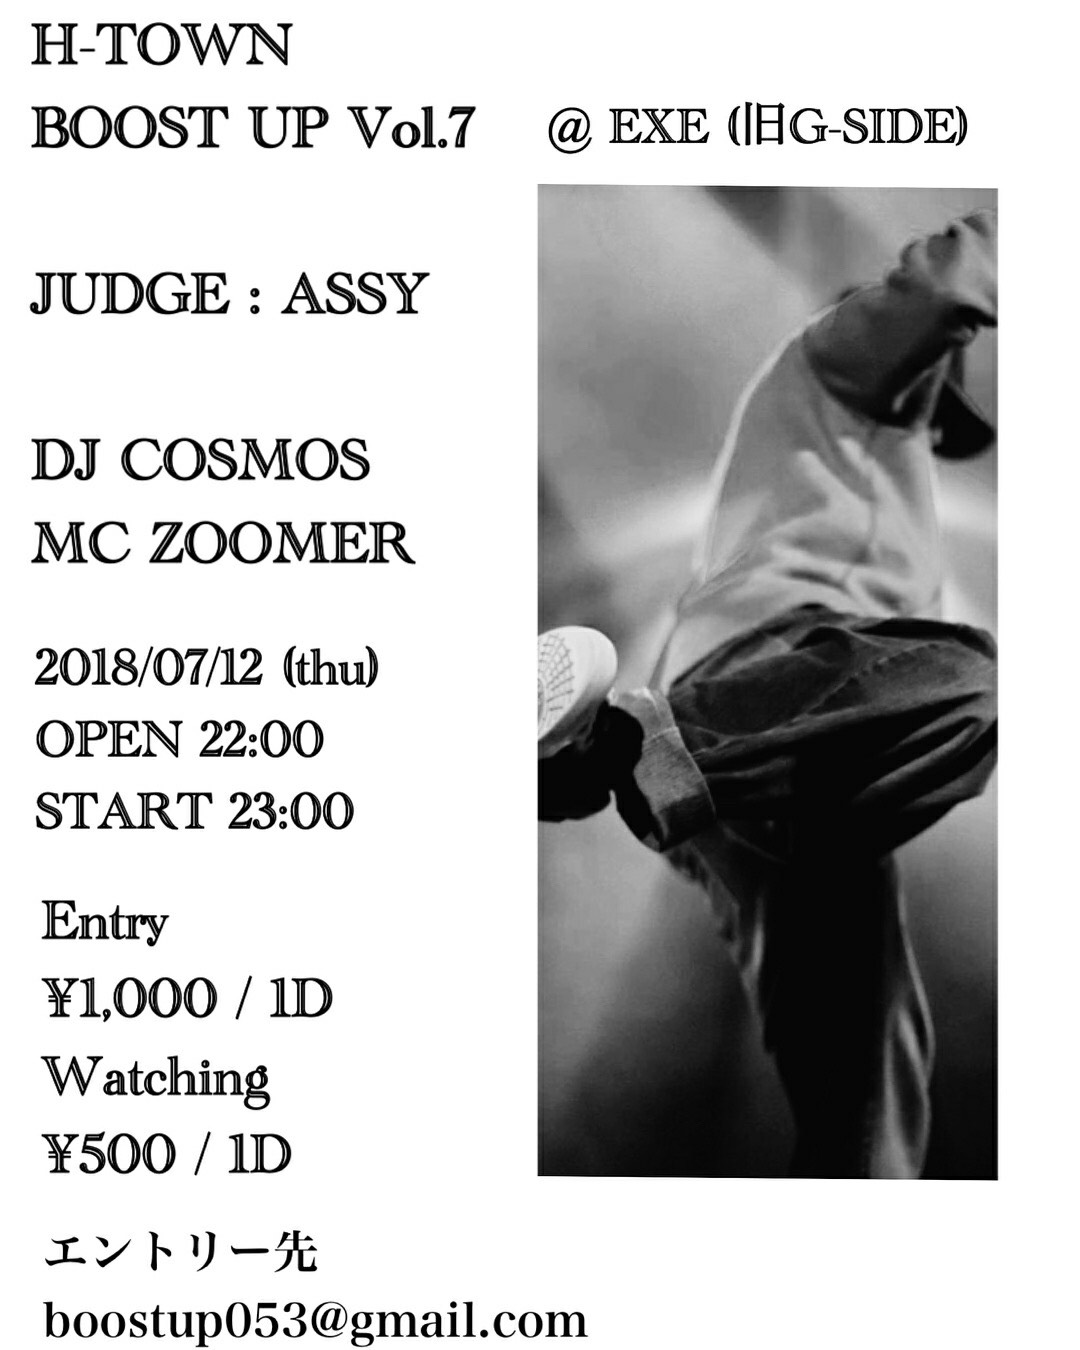 7月12日木曜日 H-Town BOOST UP Vol.7